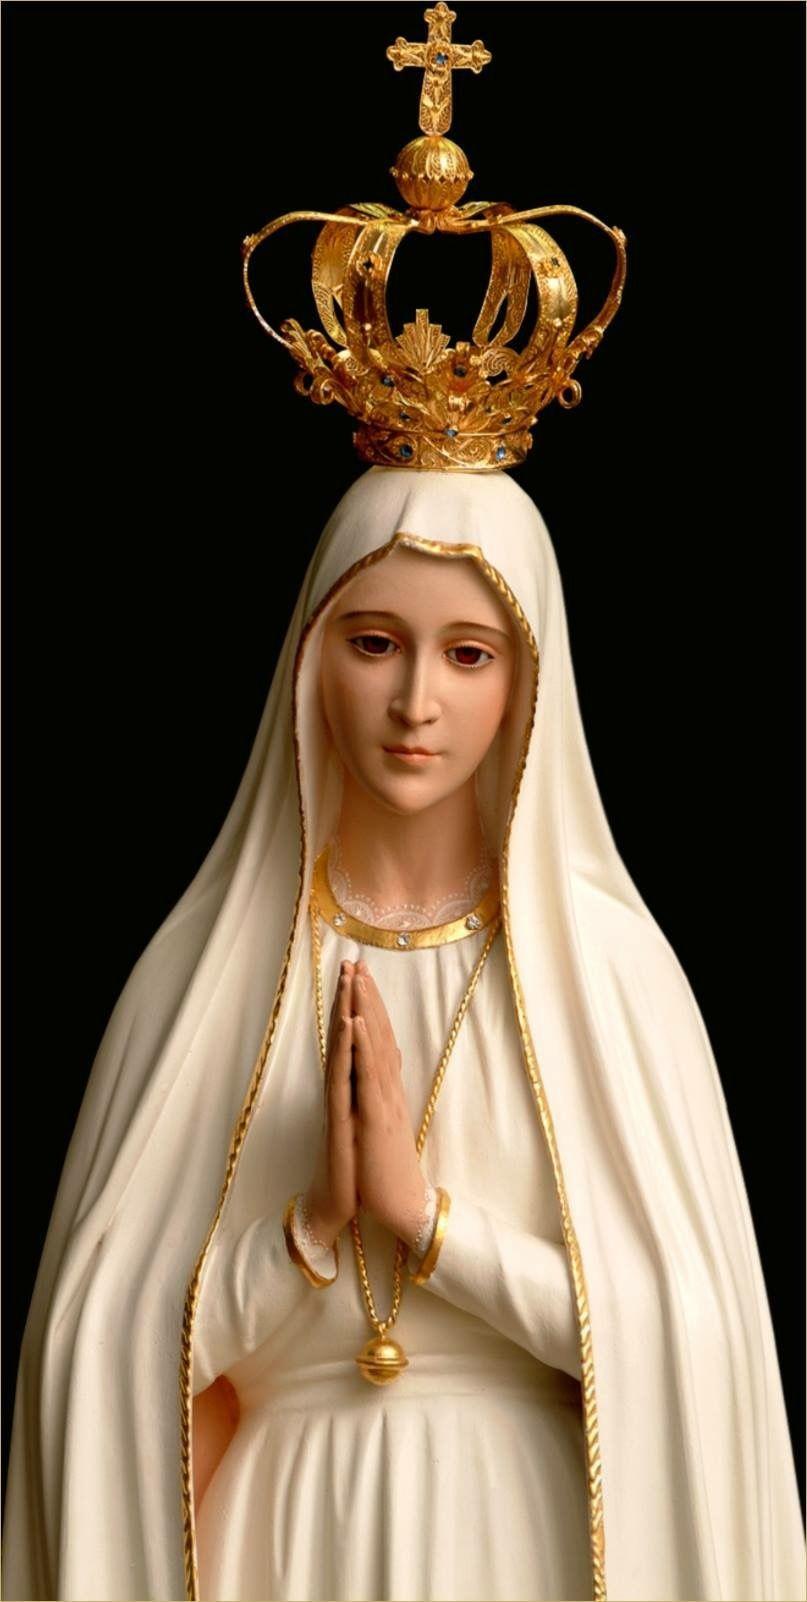 Nossa Senhora de Fátima BLESSED VIRGIN MARY Pinterest